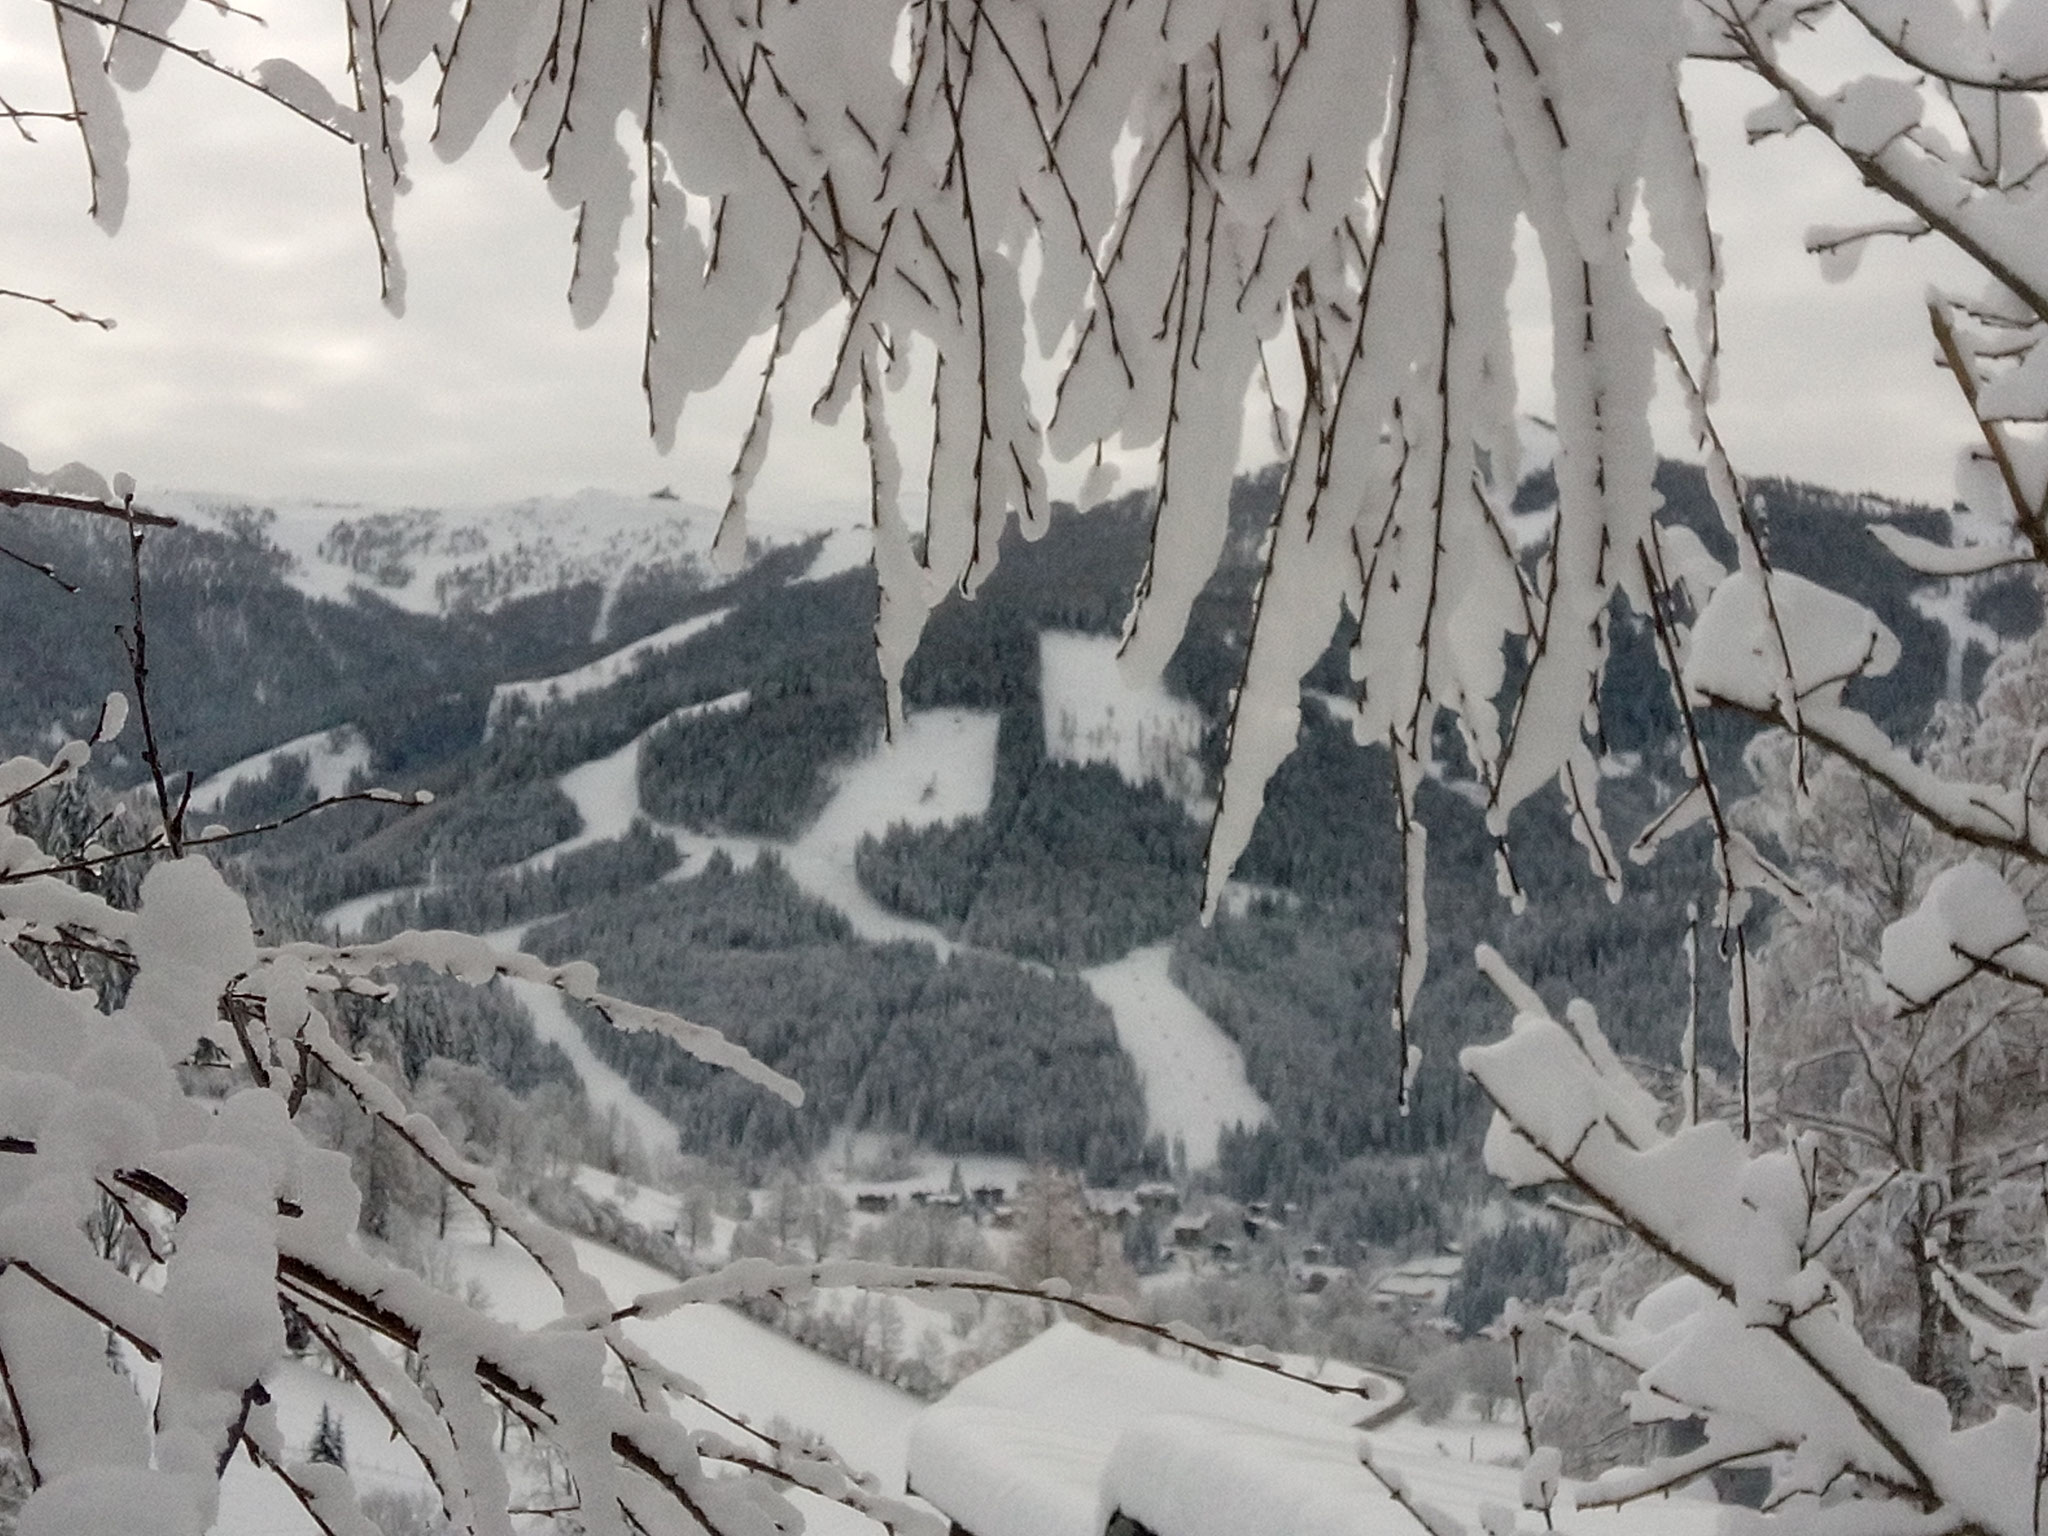 Winterzauber im Skigebiet Bad Kleinkirchheim / St. Oswald